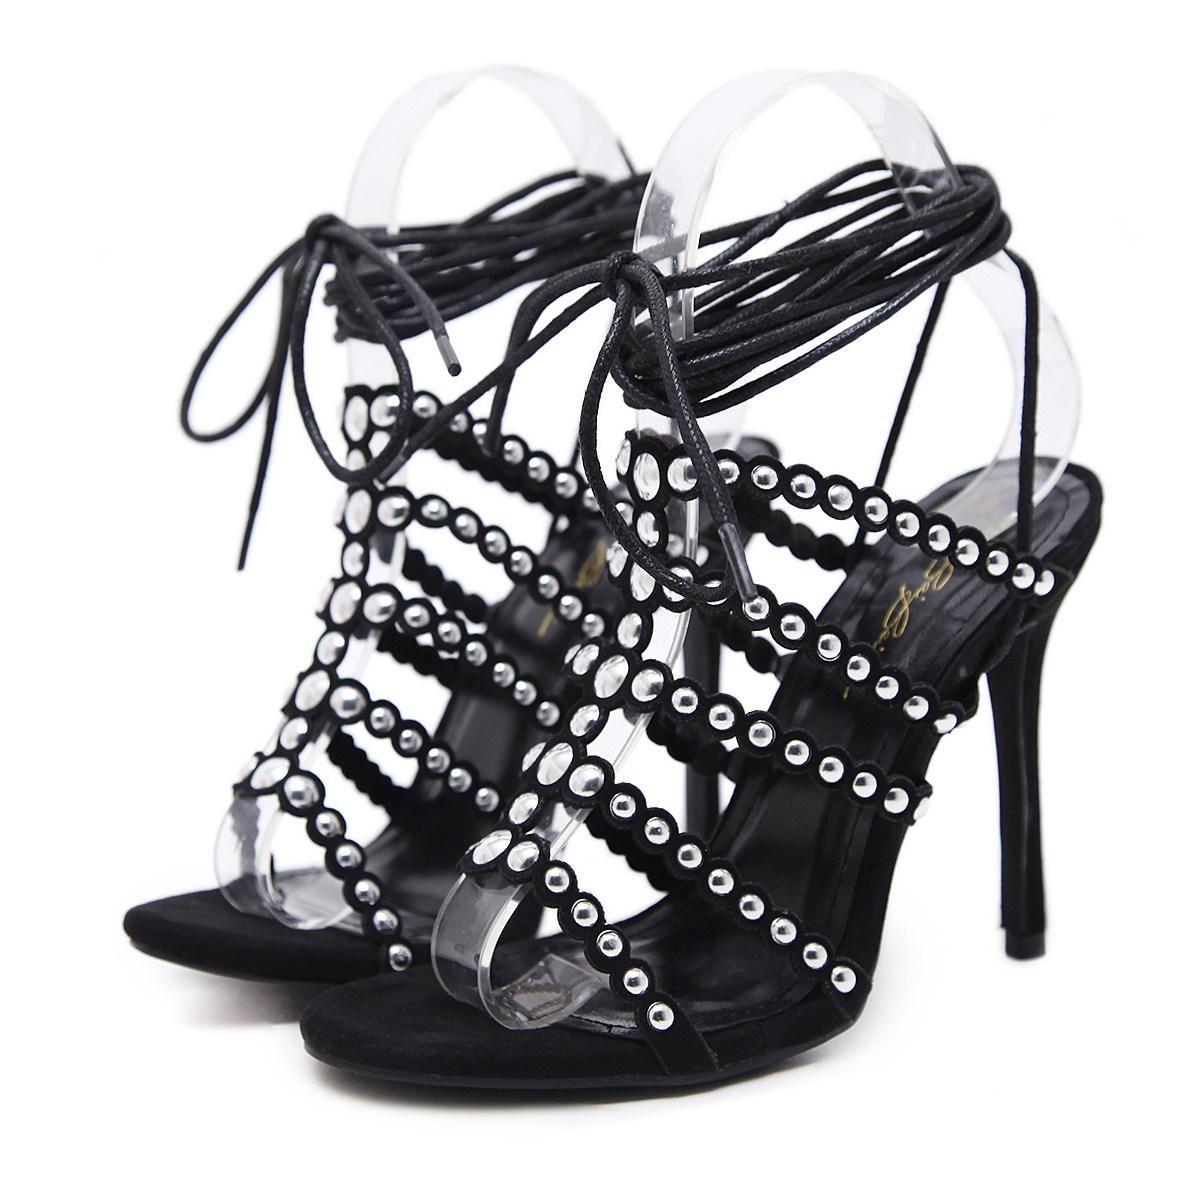 892778f2087e7 New Fashionl Women High Heel Open Toe Rivet Gladiator Catwalk Show ...